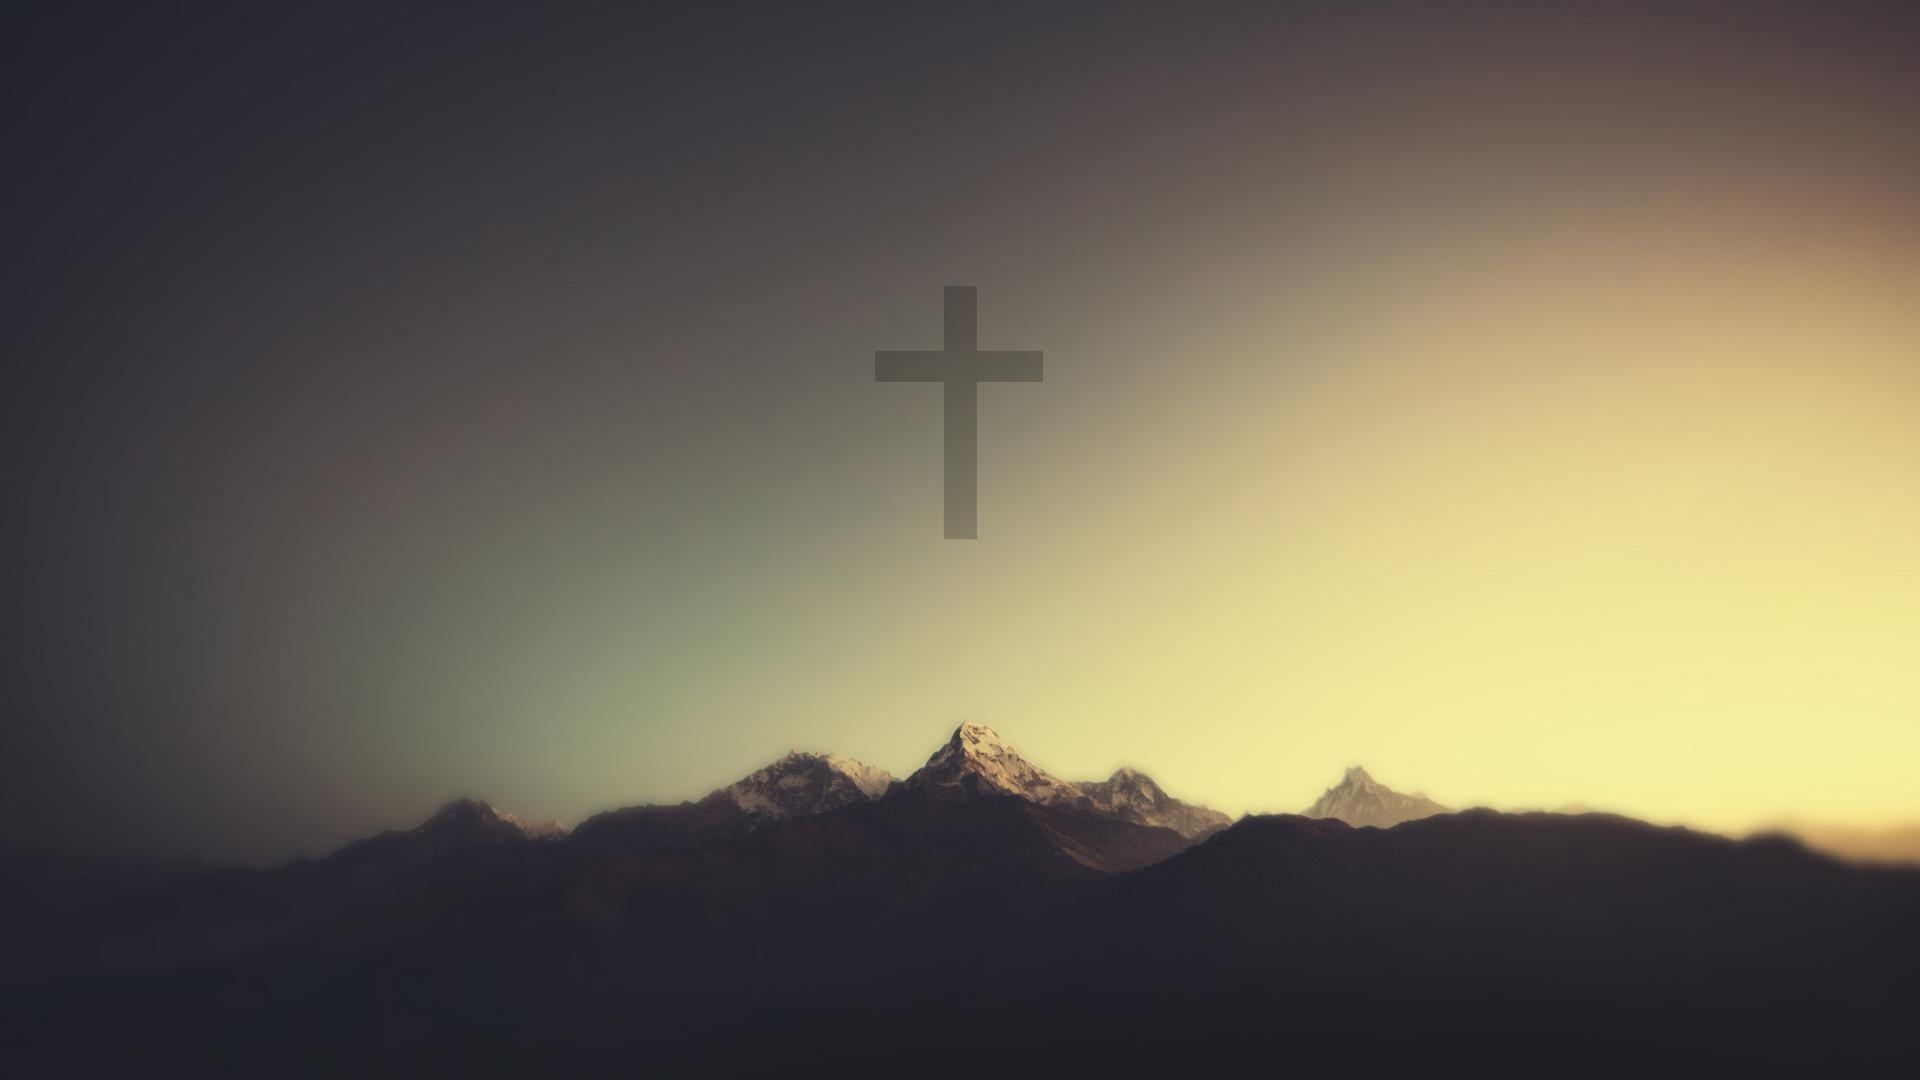 Christian Desktop Backgrounds 60 images 1920x1080